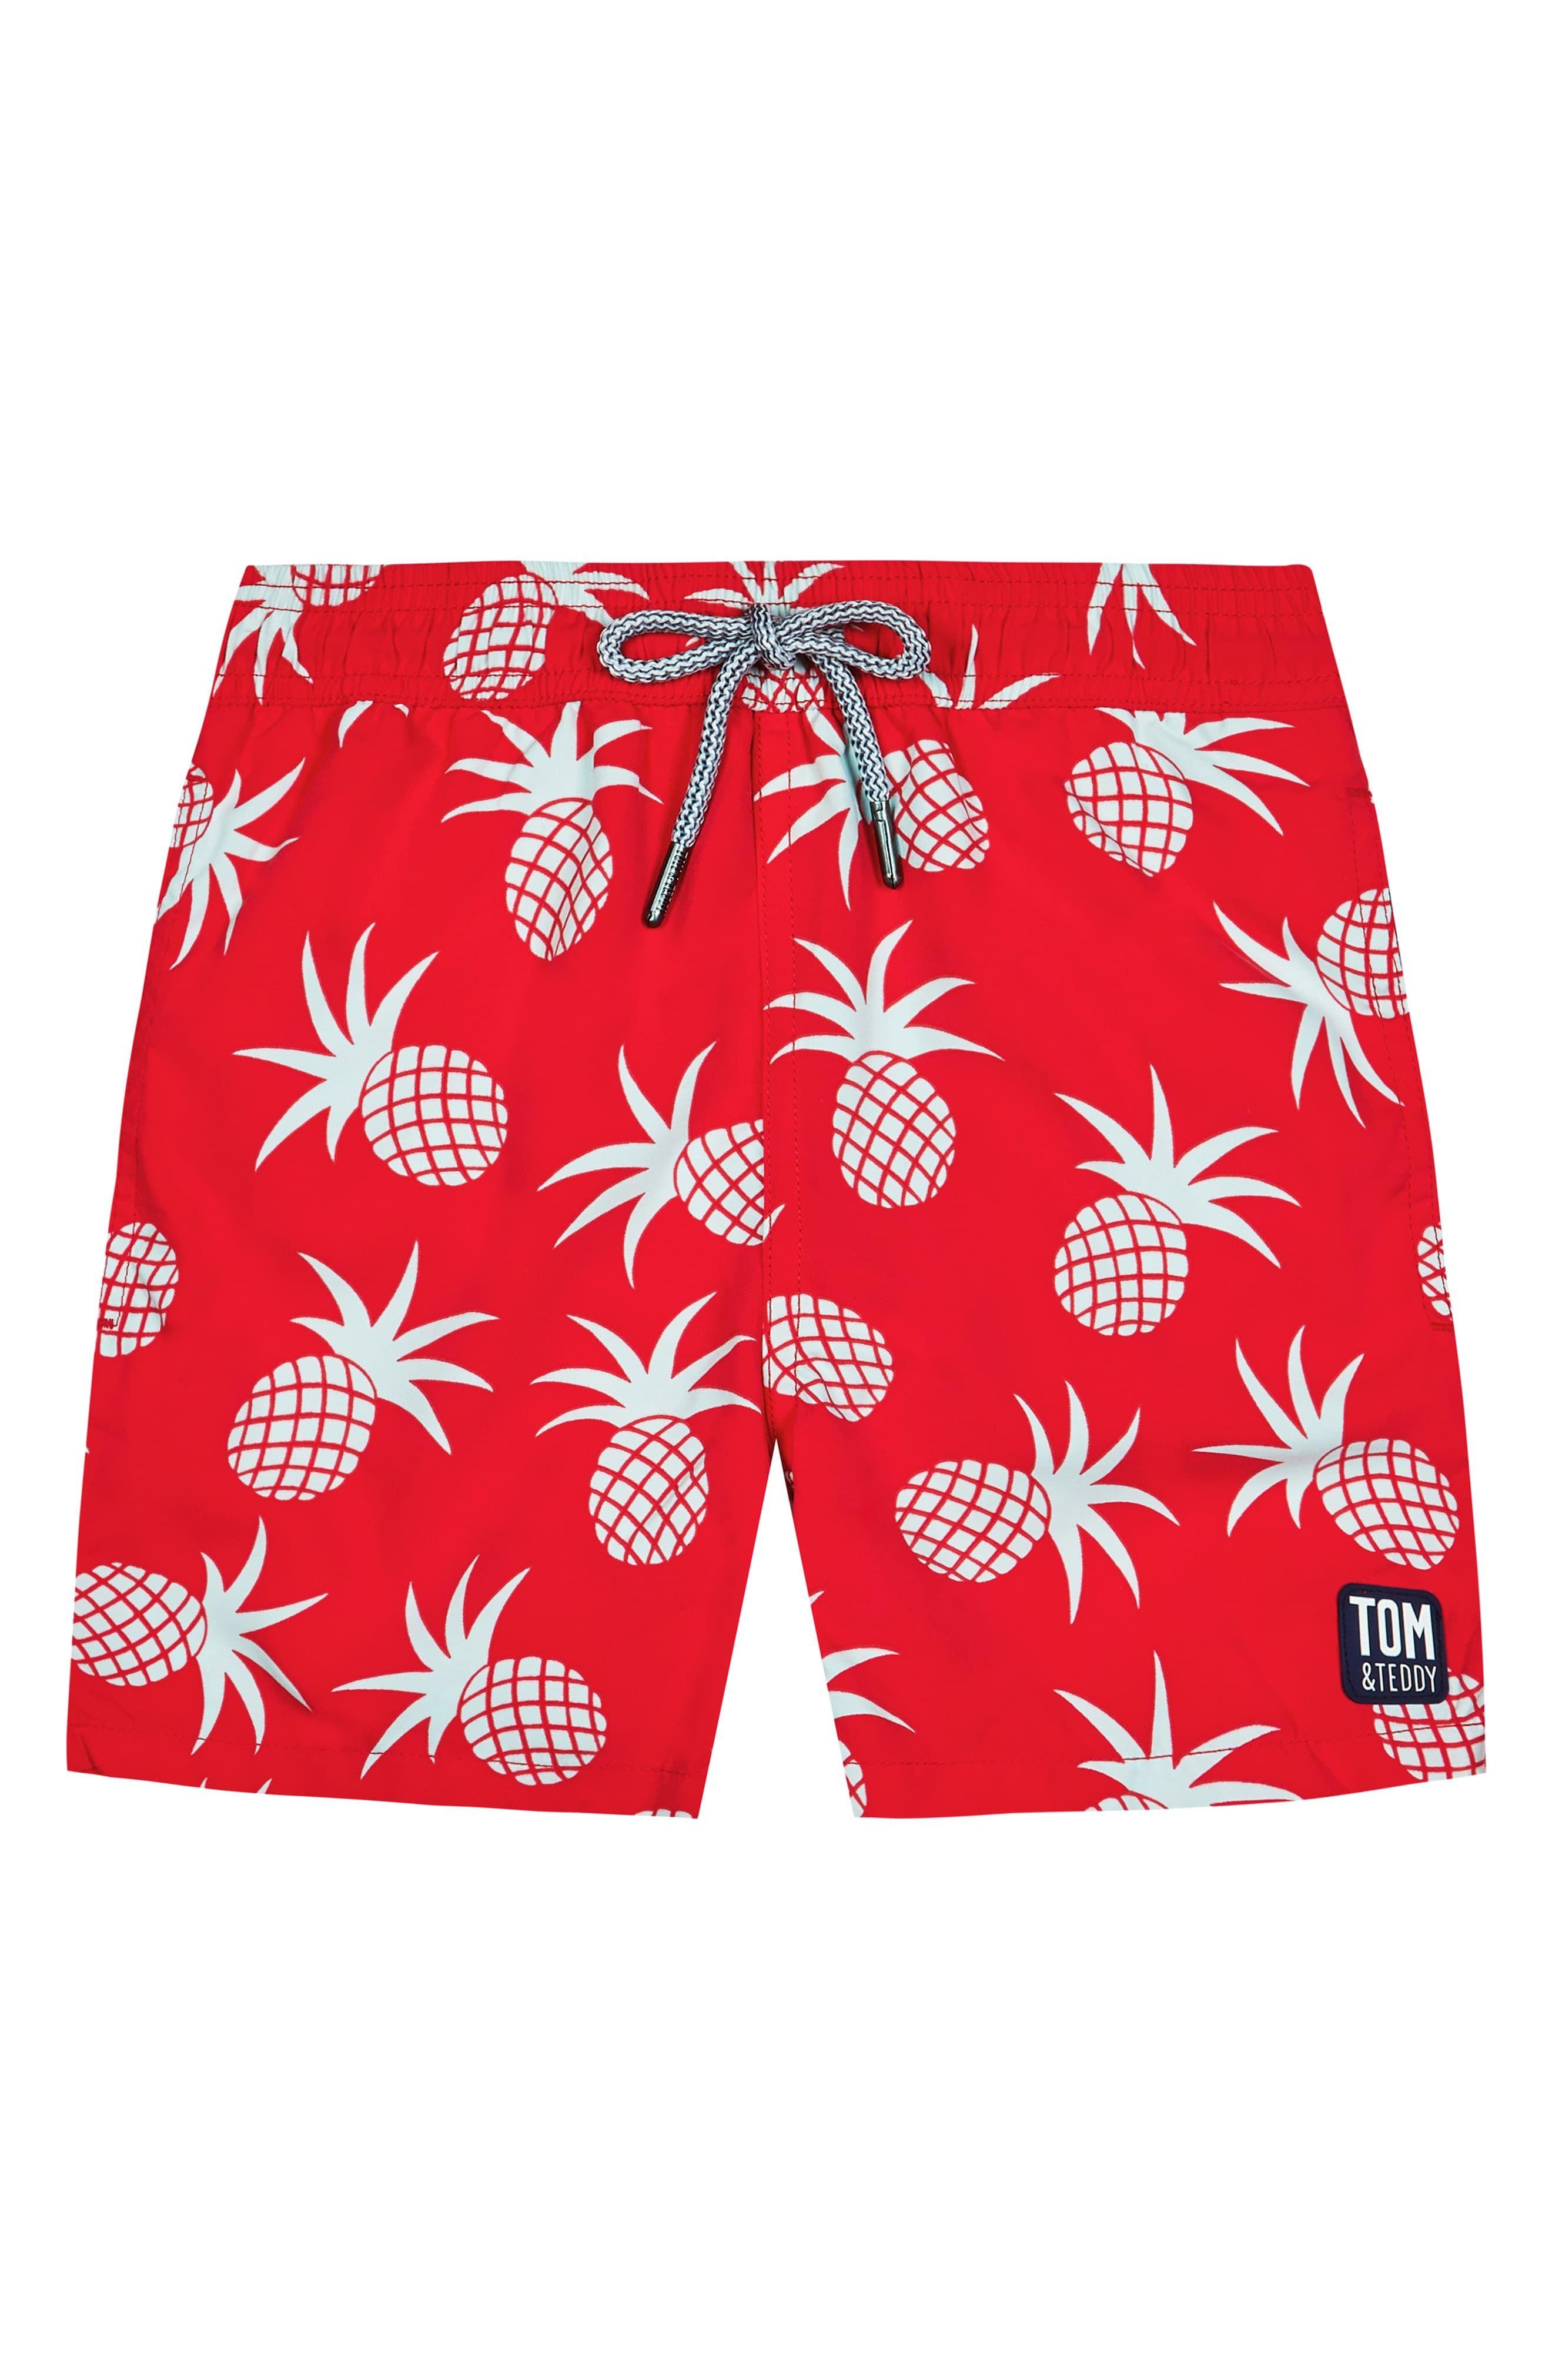 Tom /& Teddy Boys Pineapple